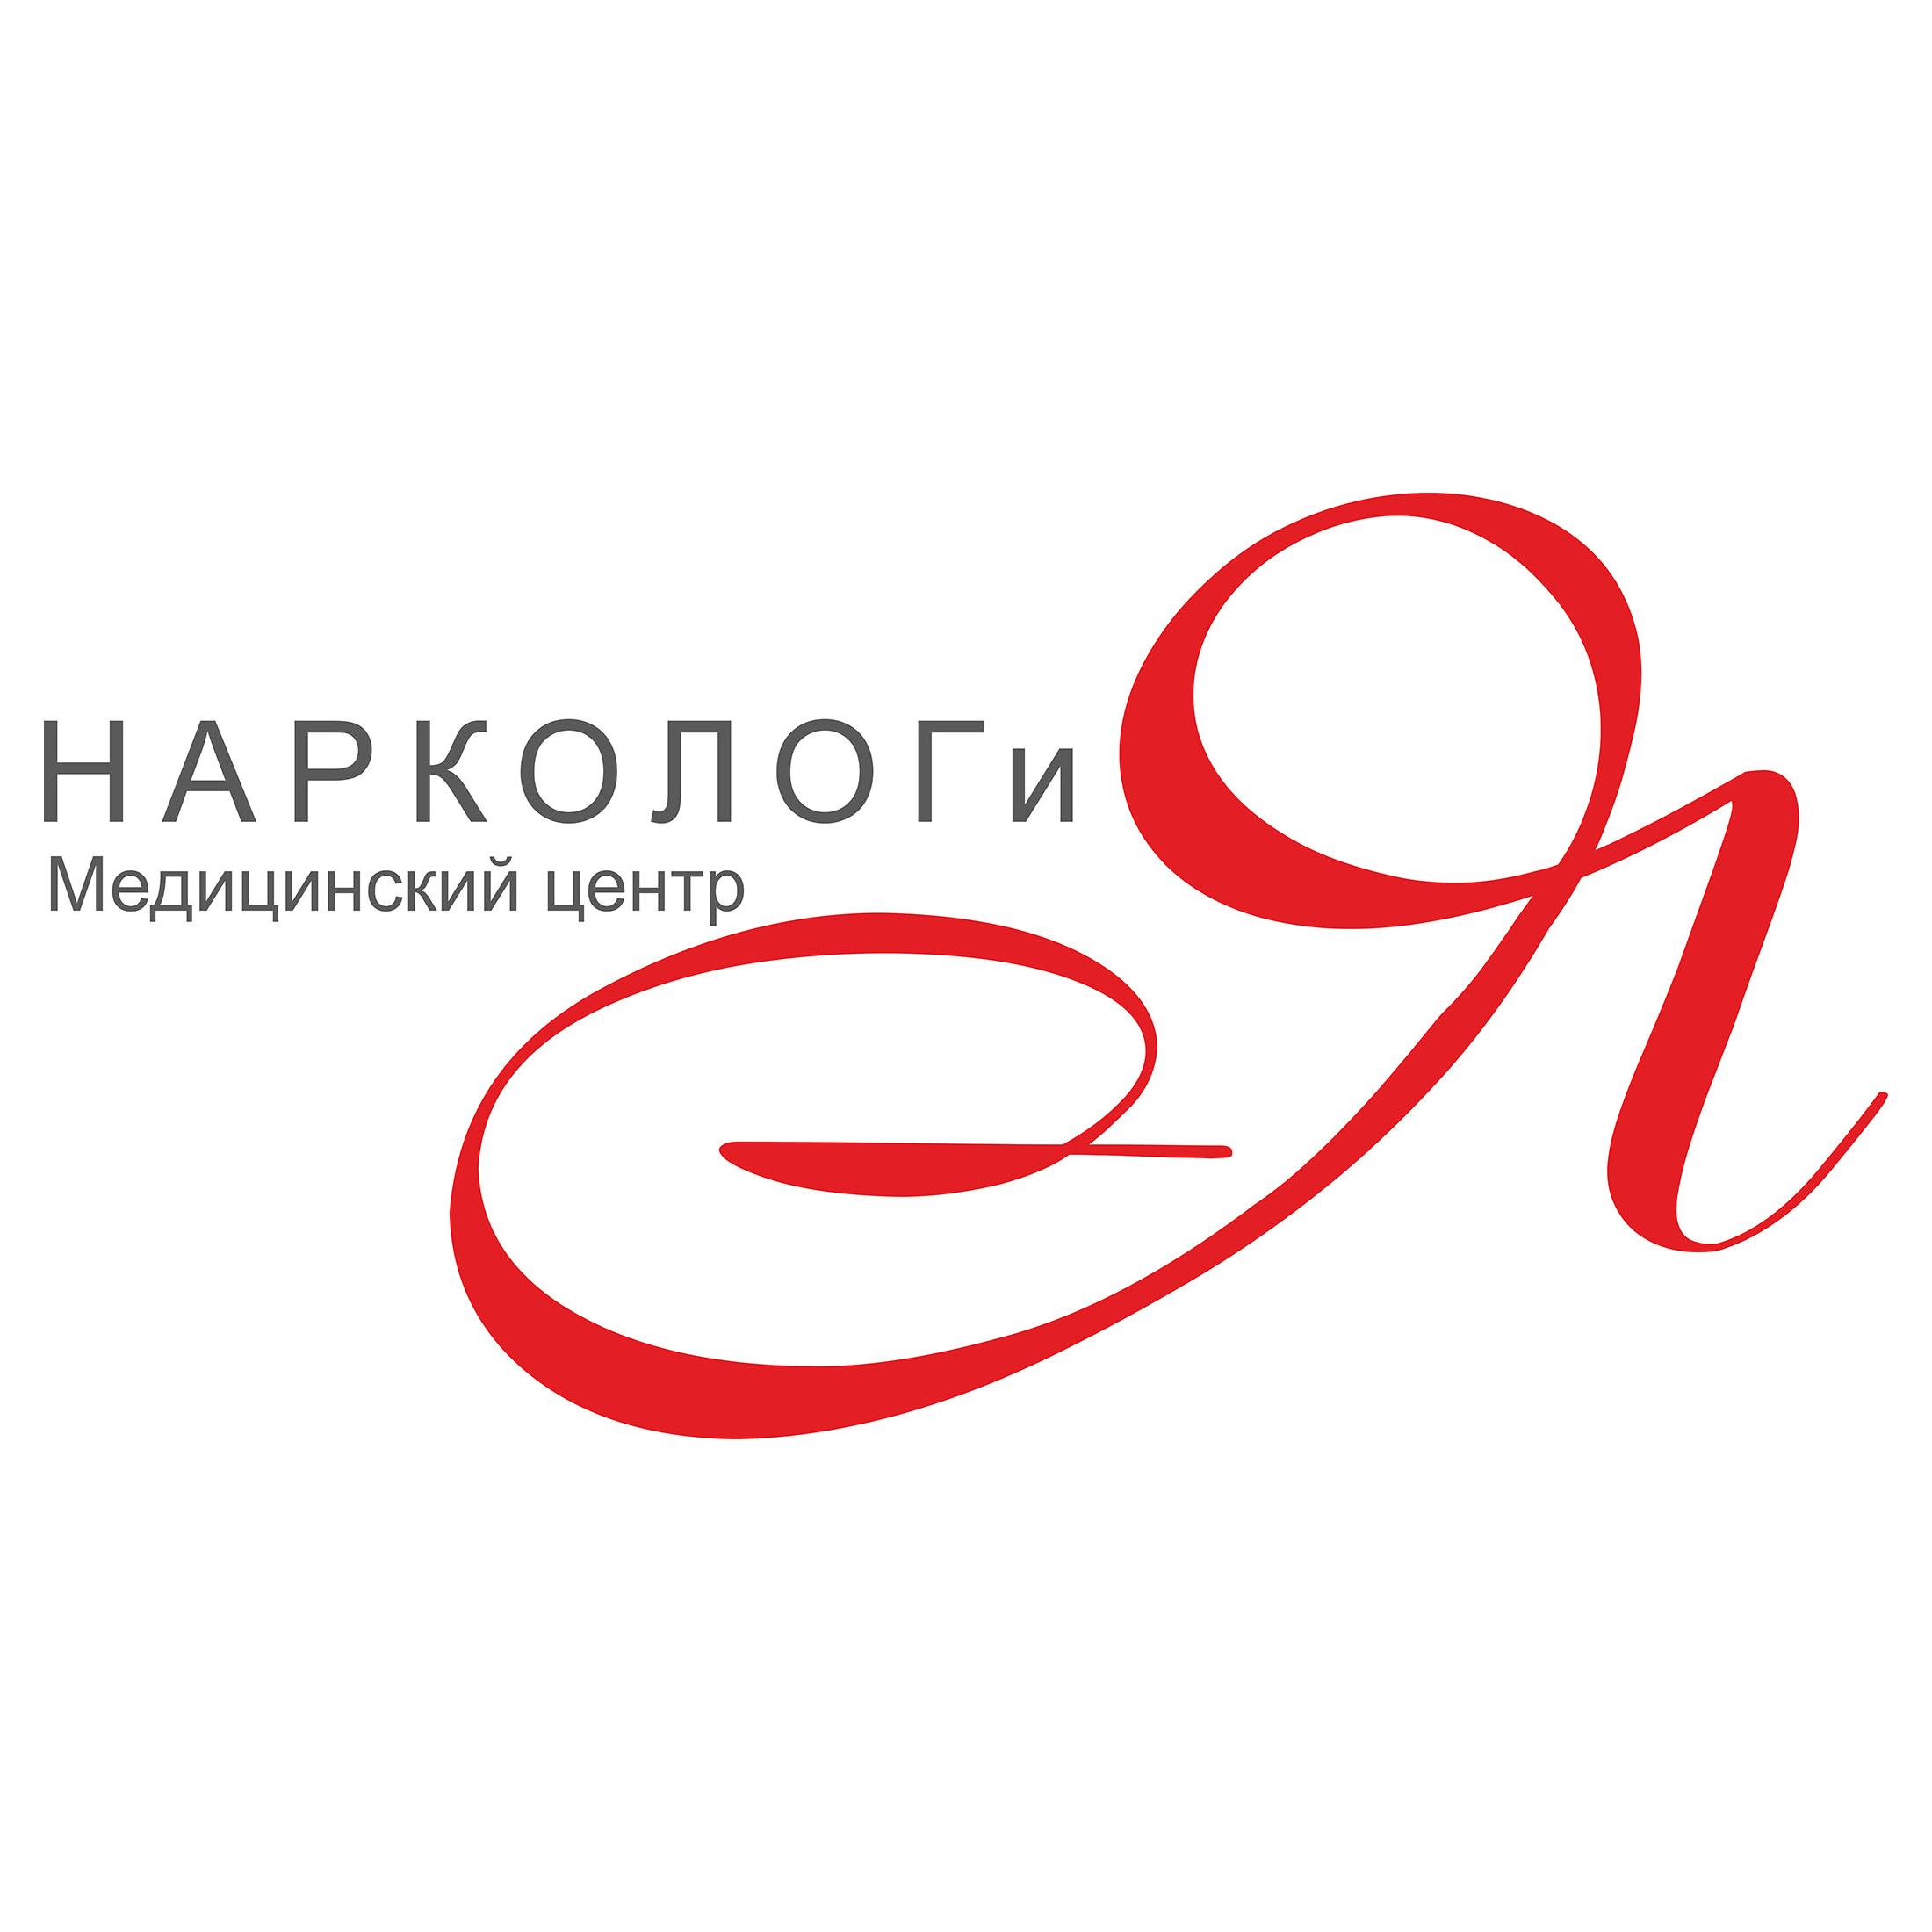 Хариса юсупова 62а наркология челябинск кодирование от алкоголизма в хомутово